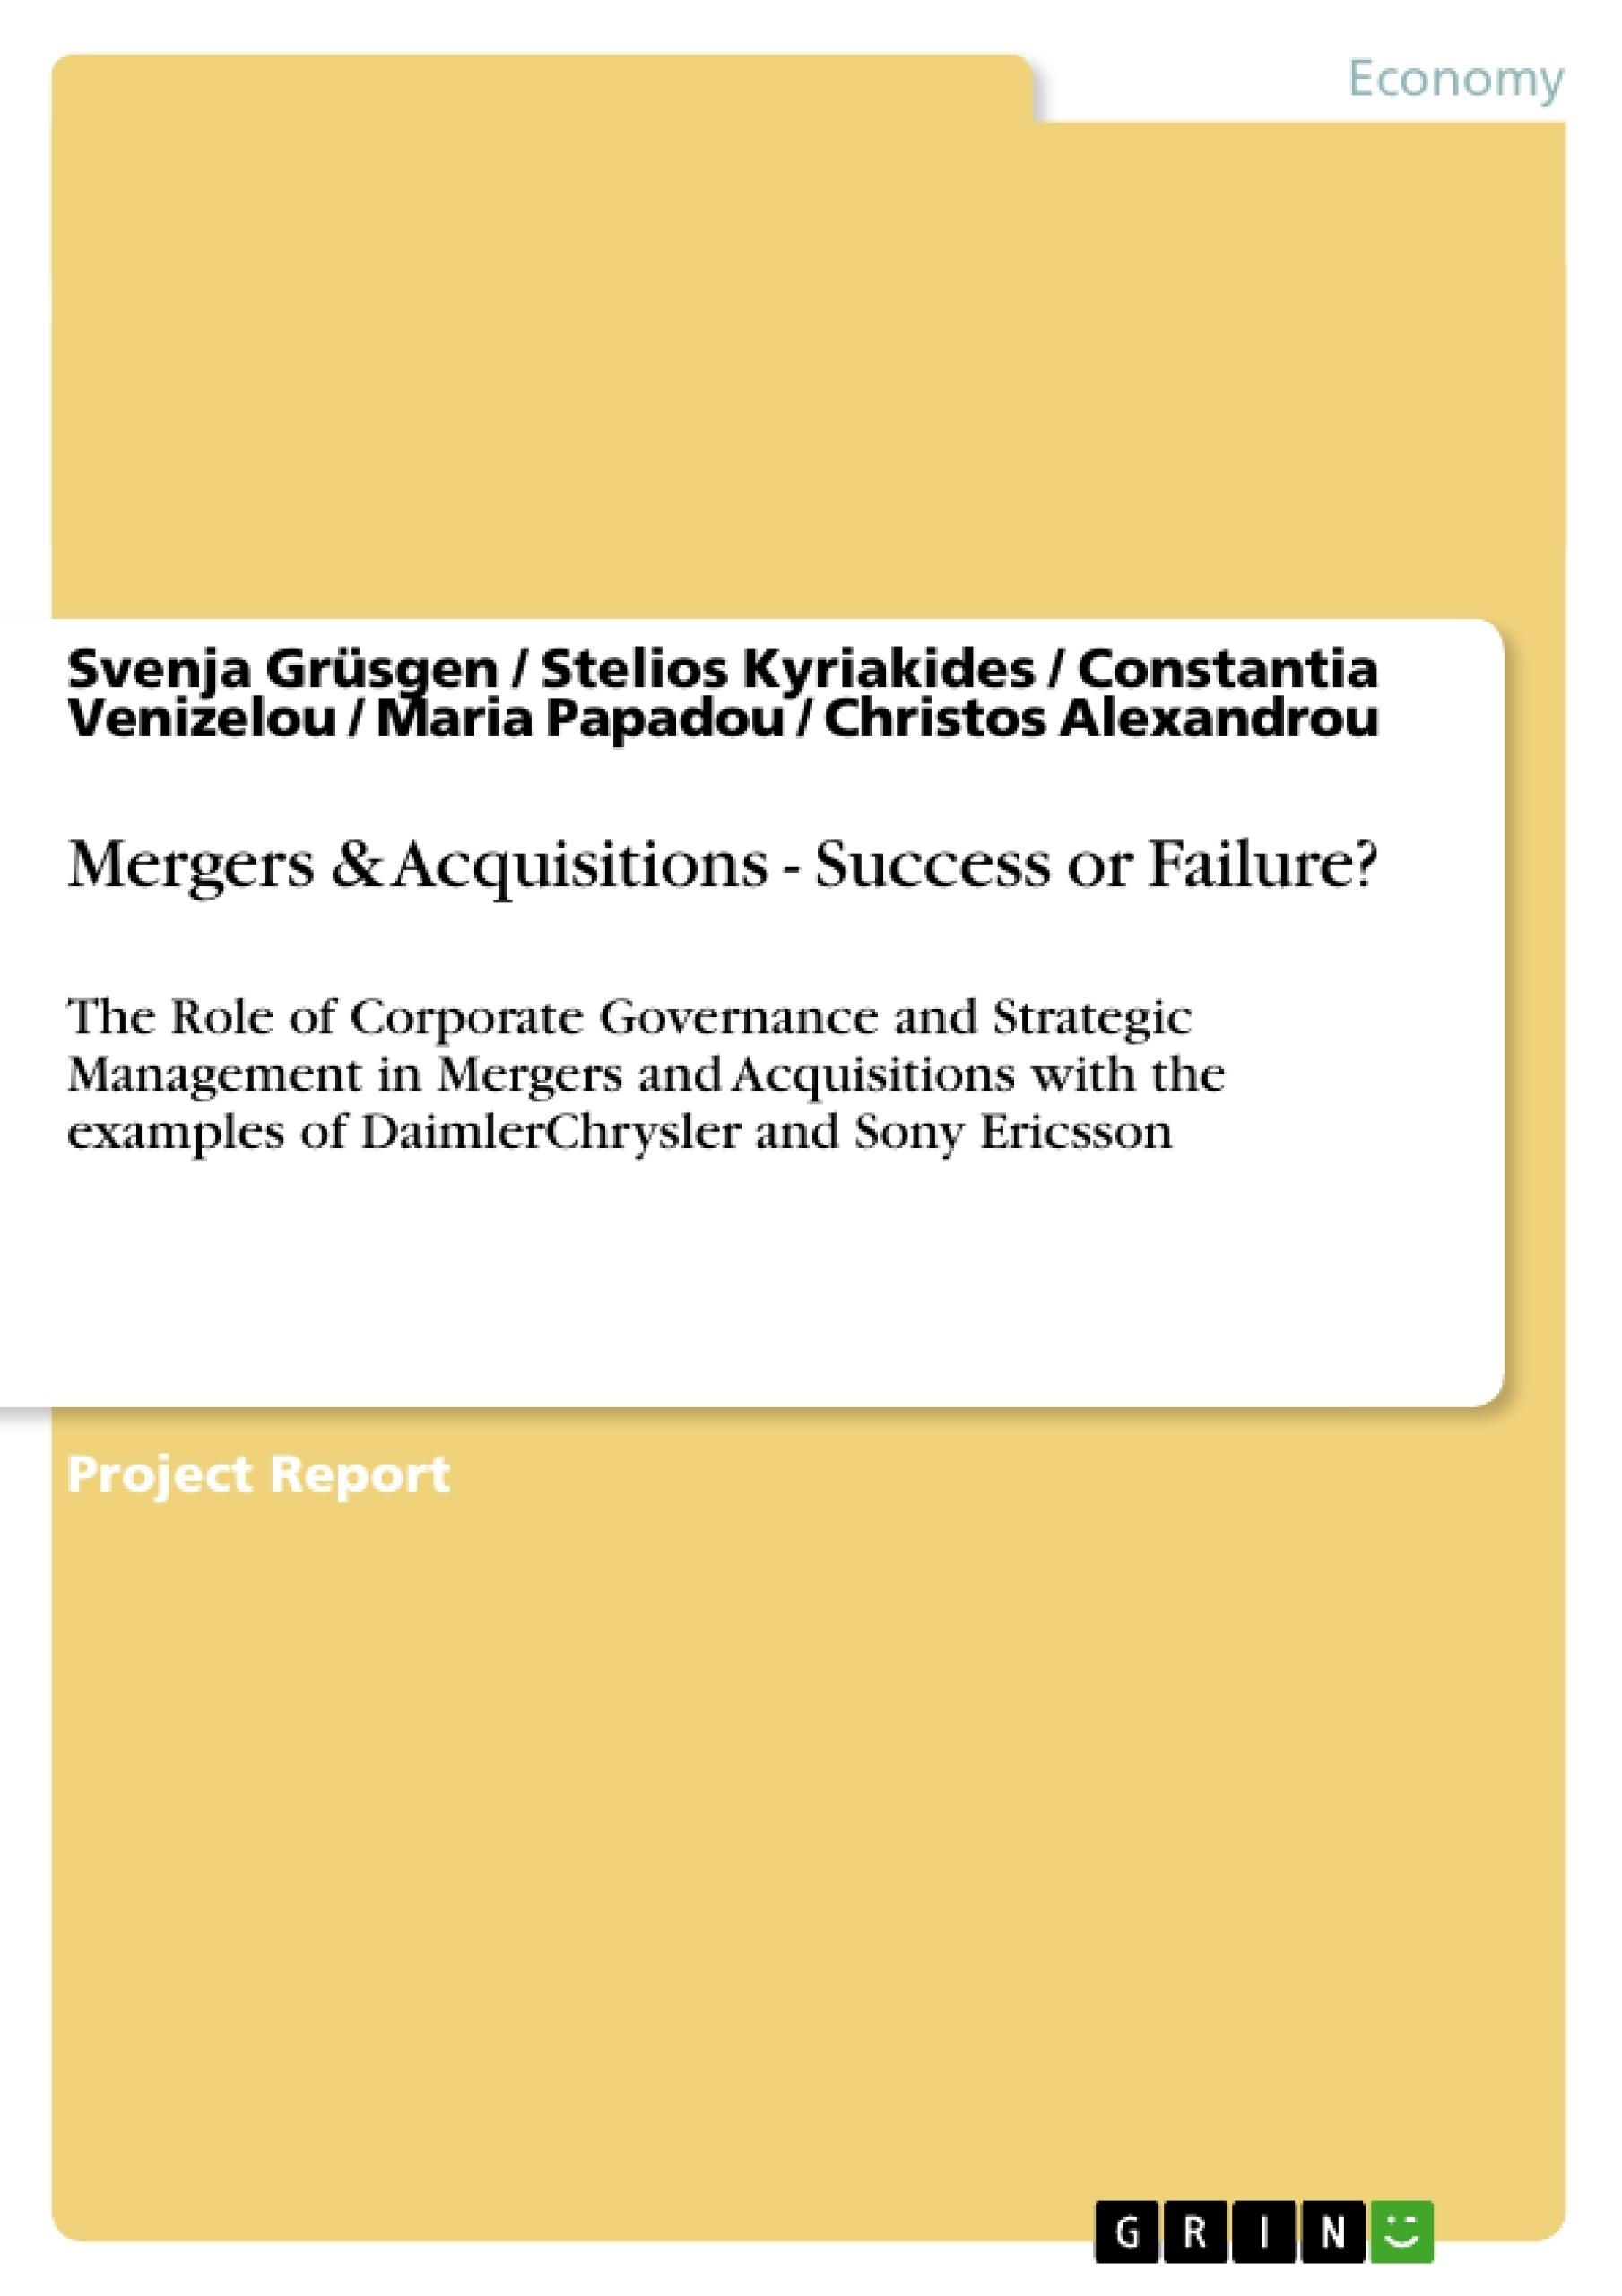 Title: Mergers & Acquisitions - Success or Failure?